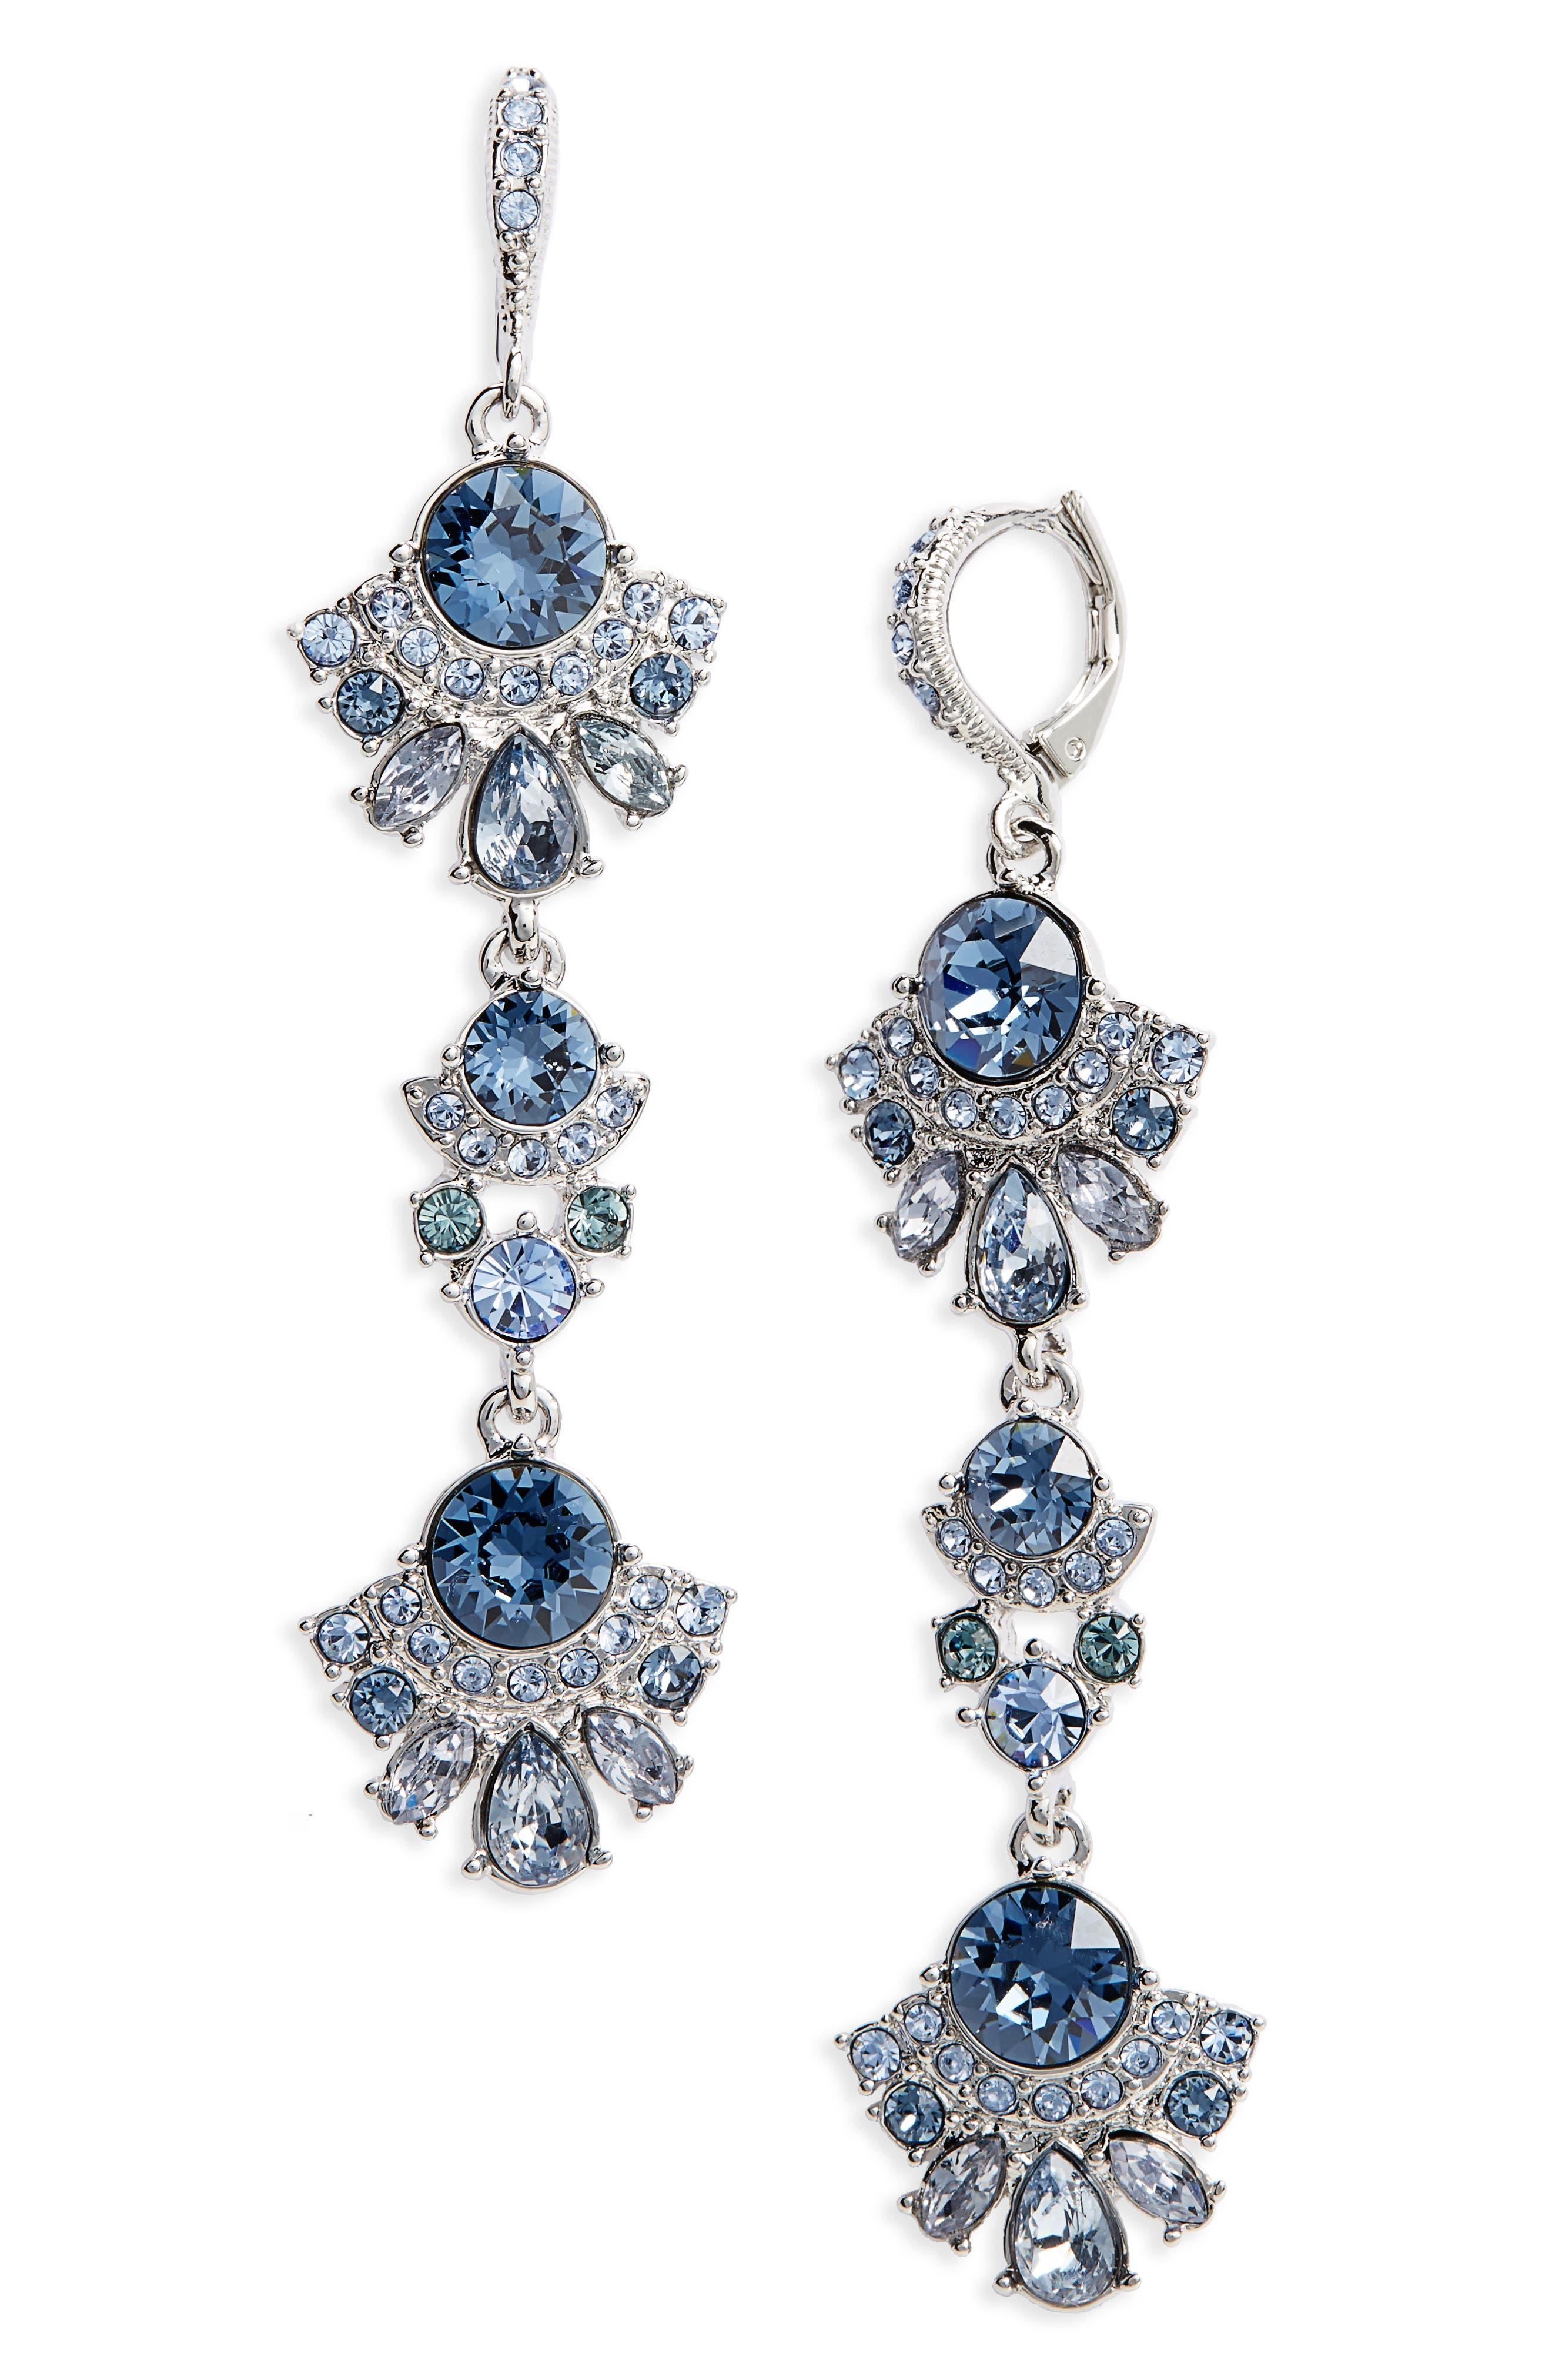 Verona Linear Earrings,                         Main,                         color, Blue / Silver